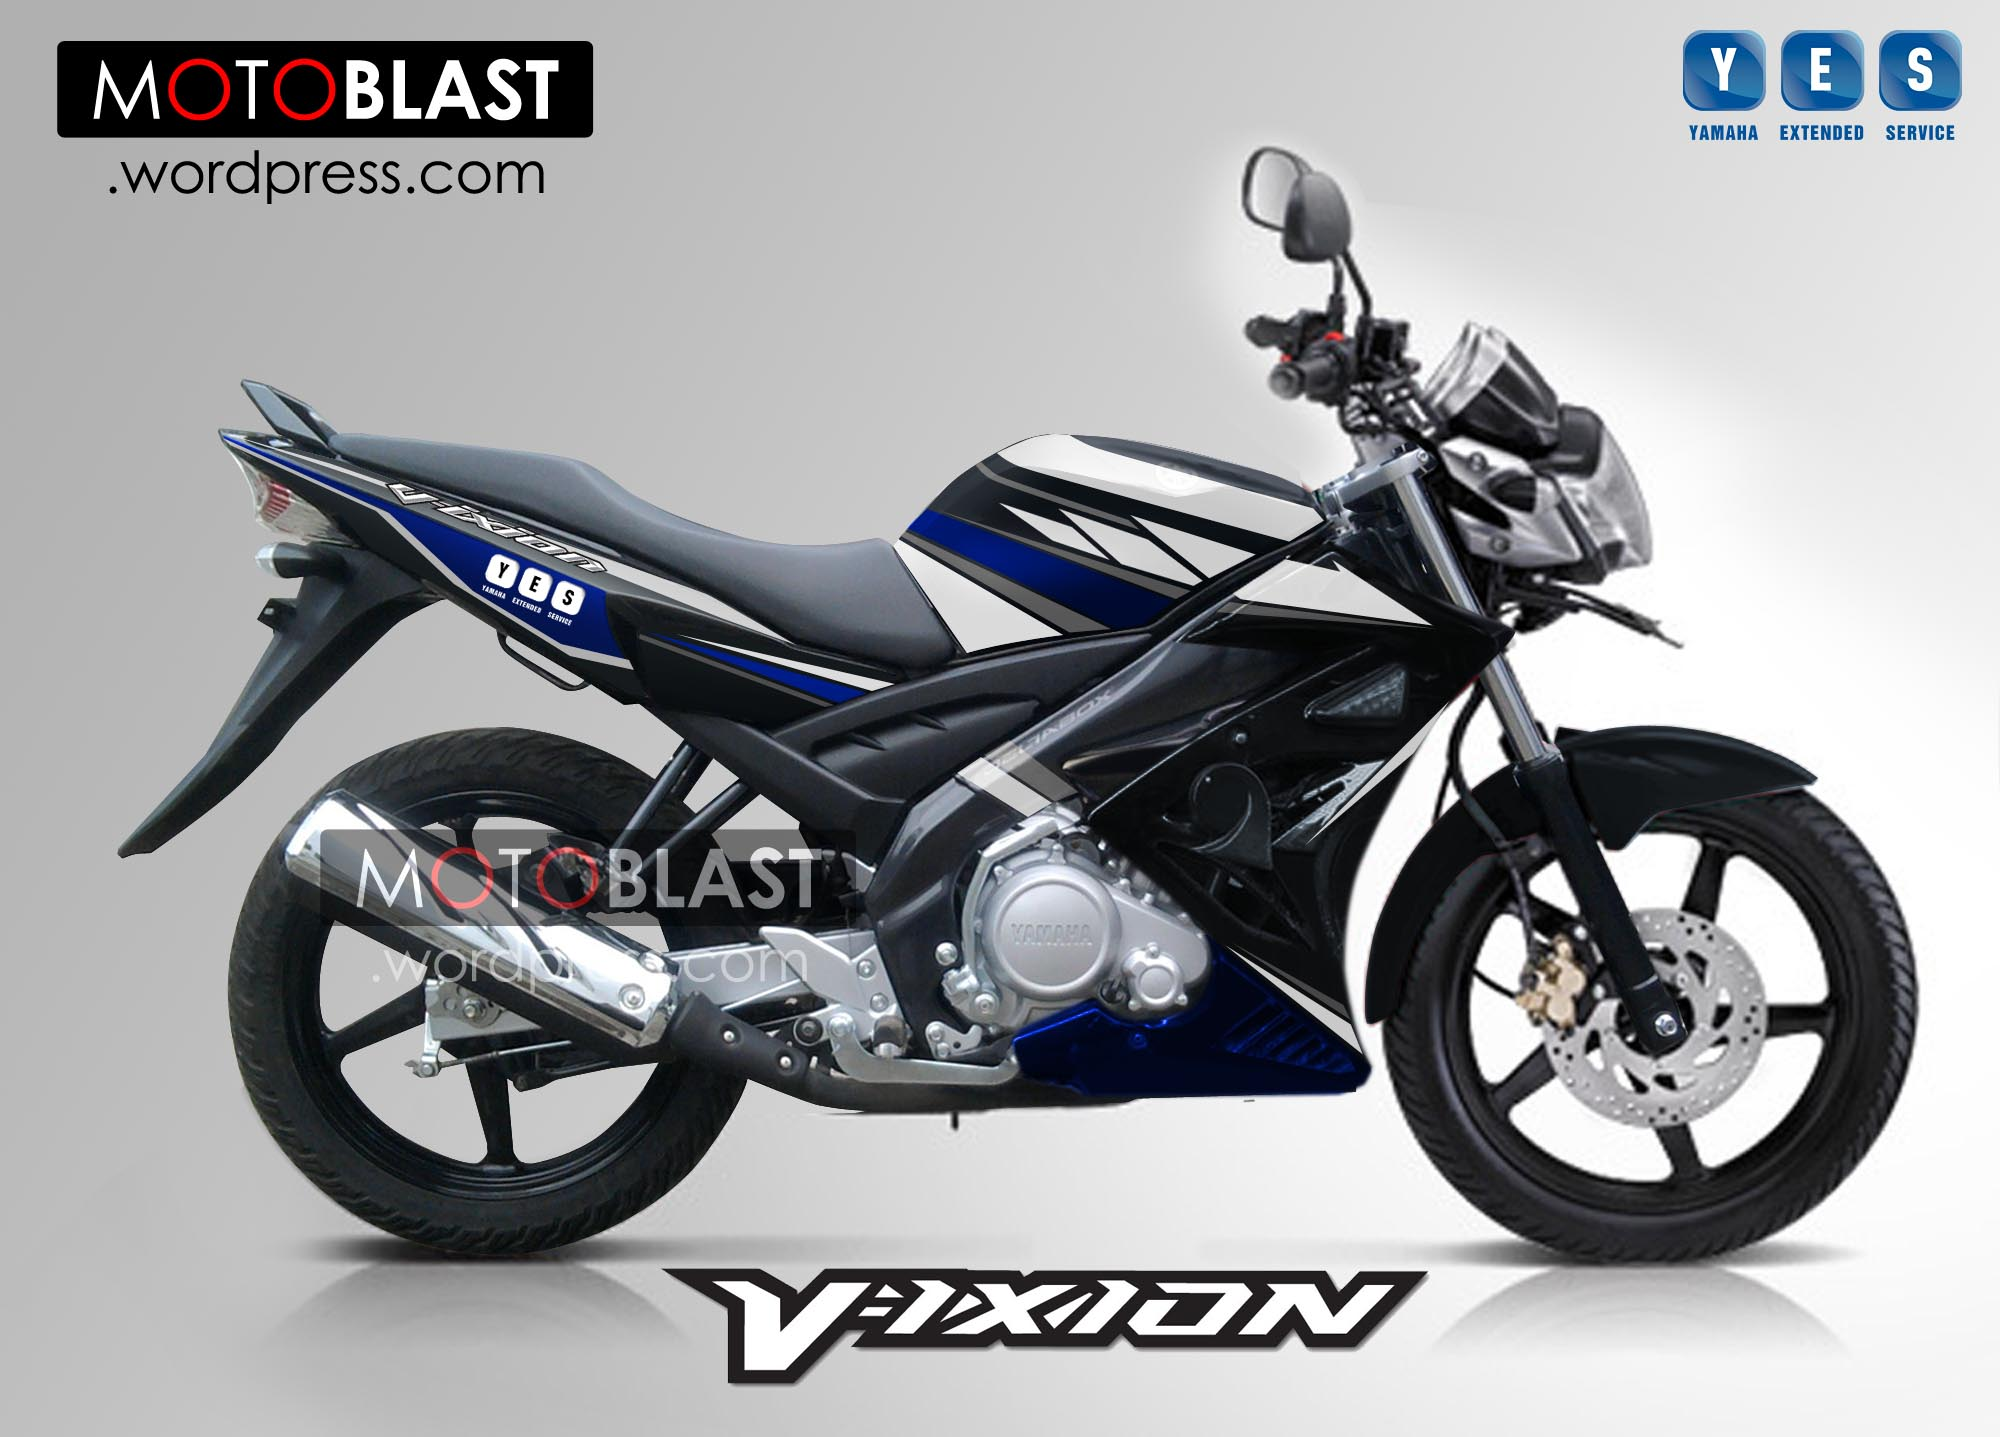 Modif Striping Yamaha Vixion